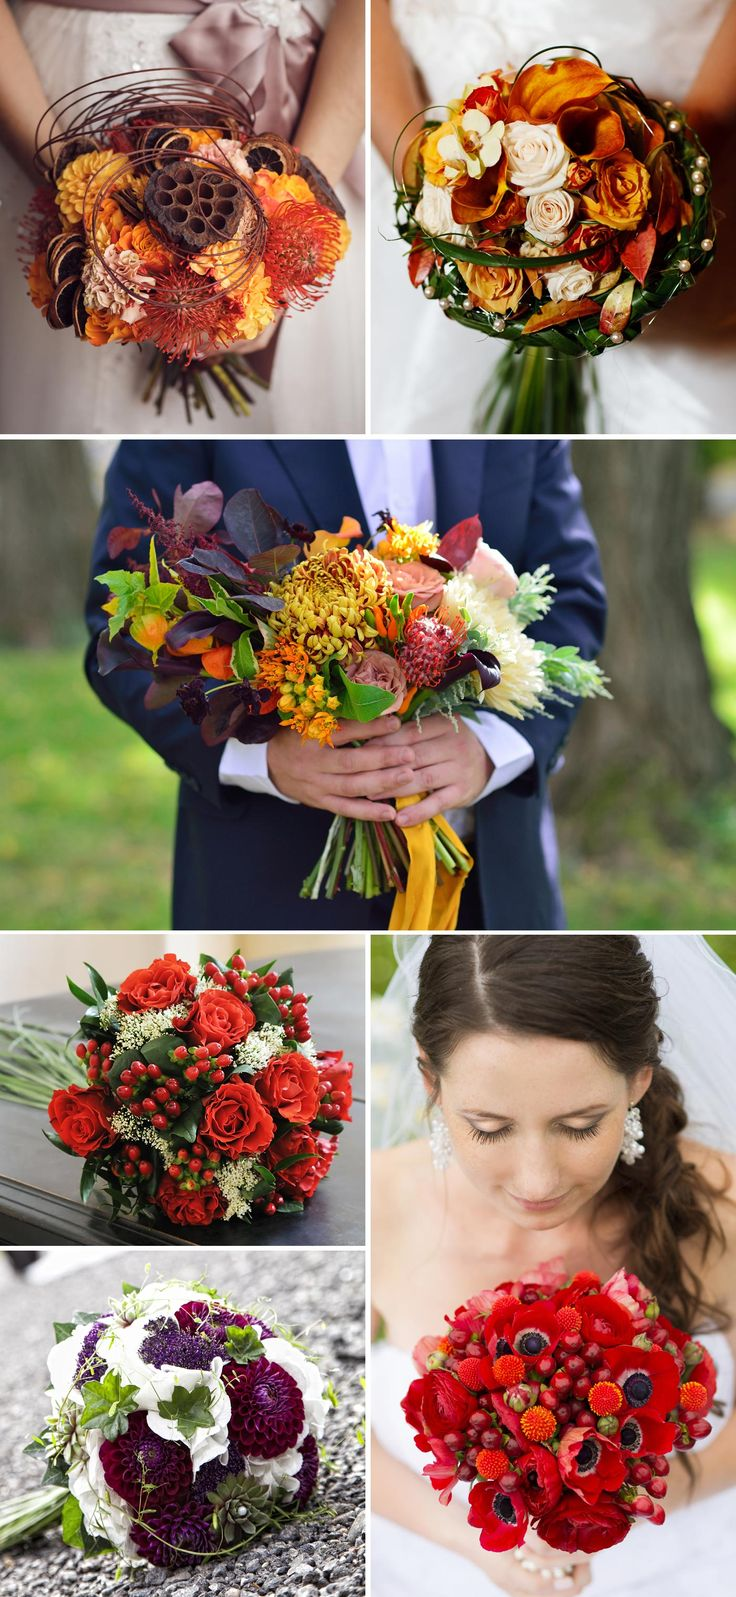 Blumen Im November Claudia Blumen Im November Reportage Galerie Tr